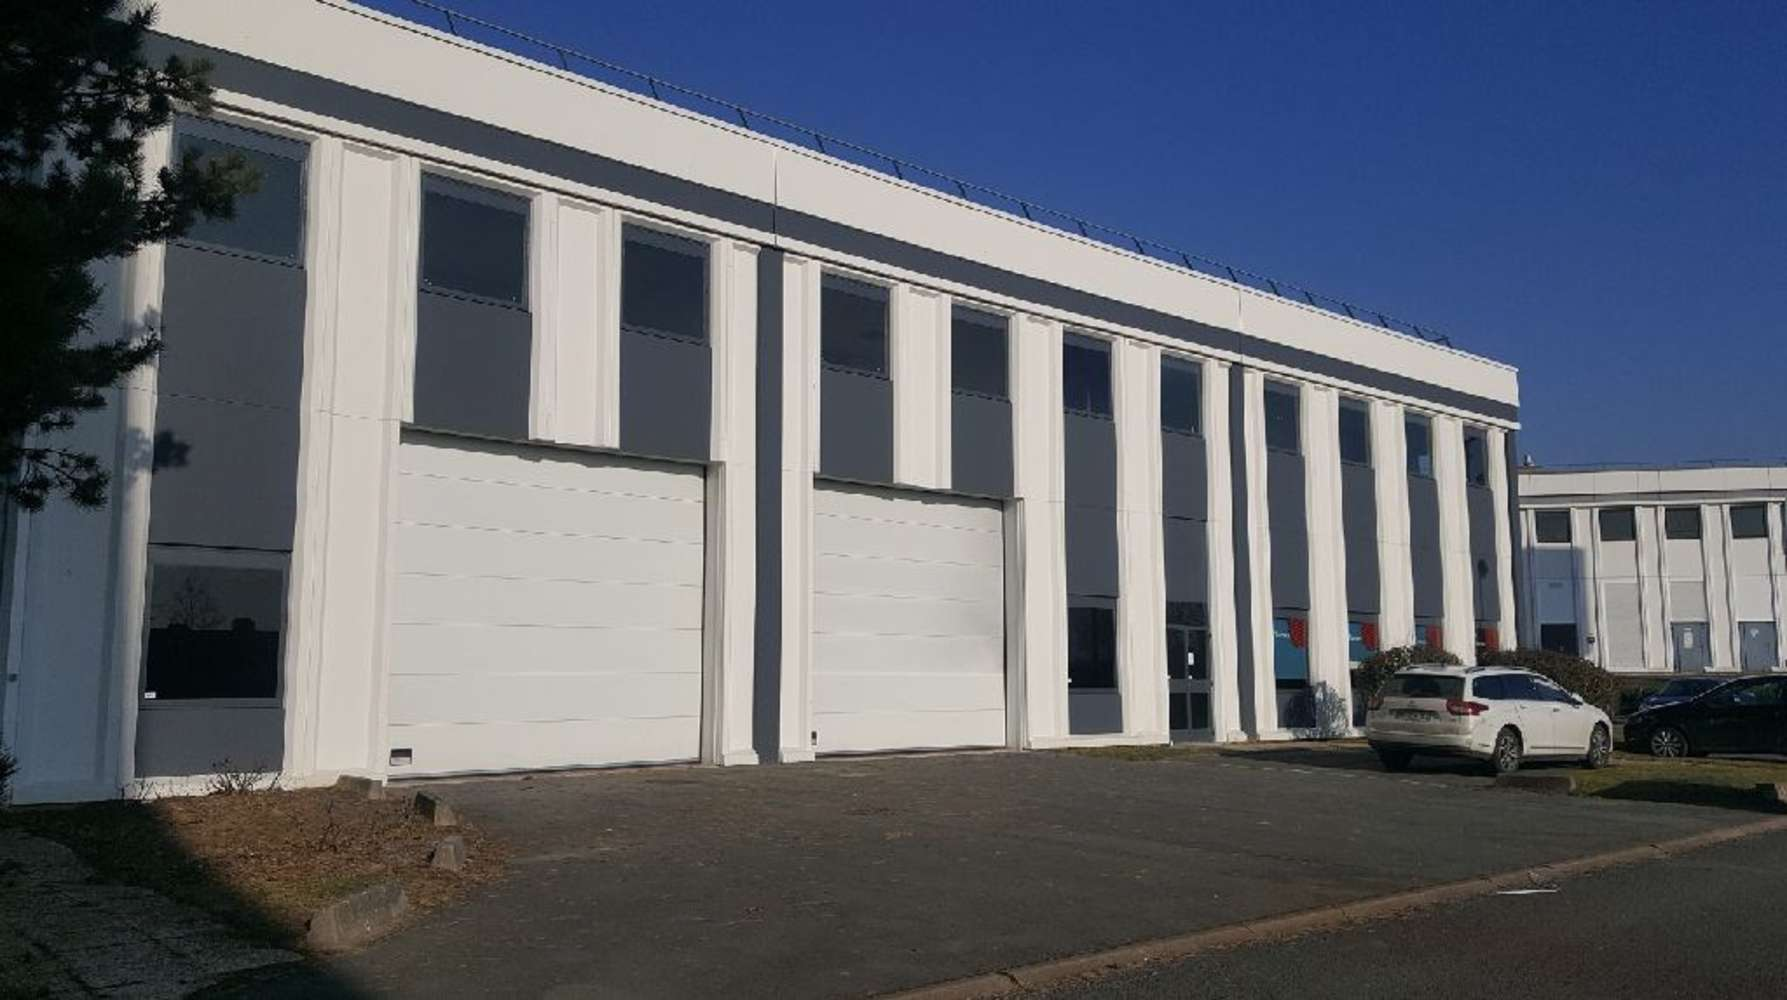 Activités/entrepôt Villebon sur yvette, 91140 - NEFLIER - 9520909